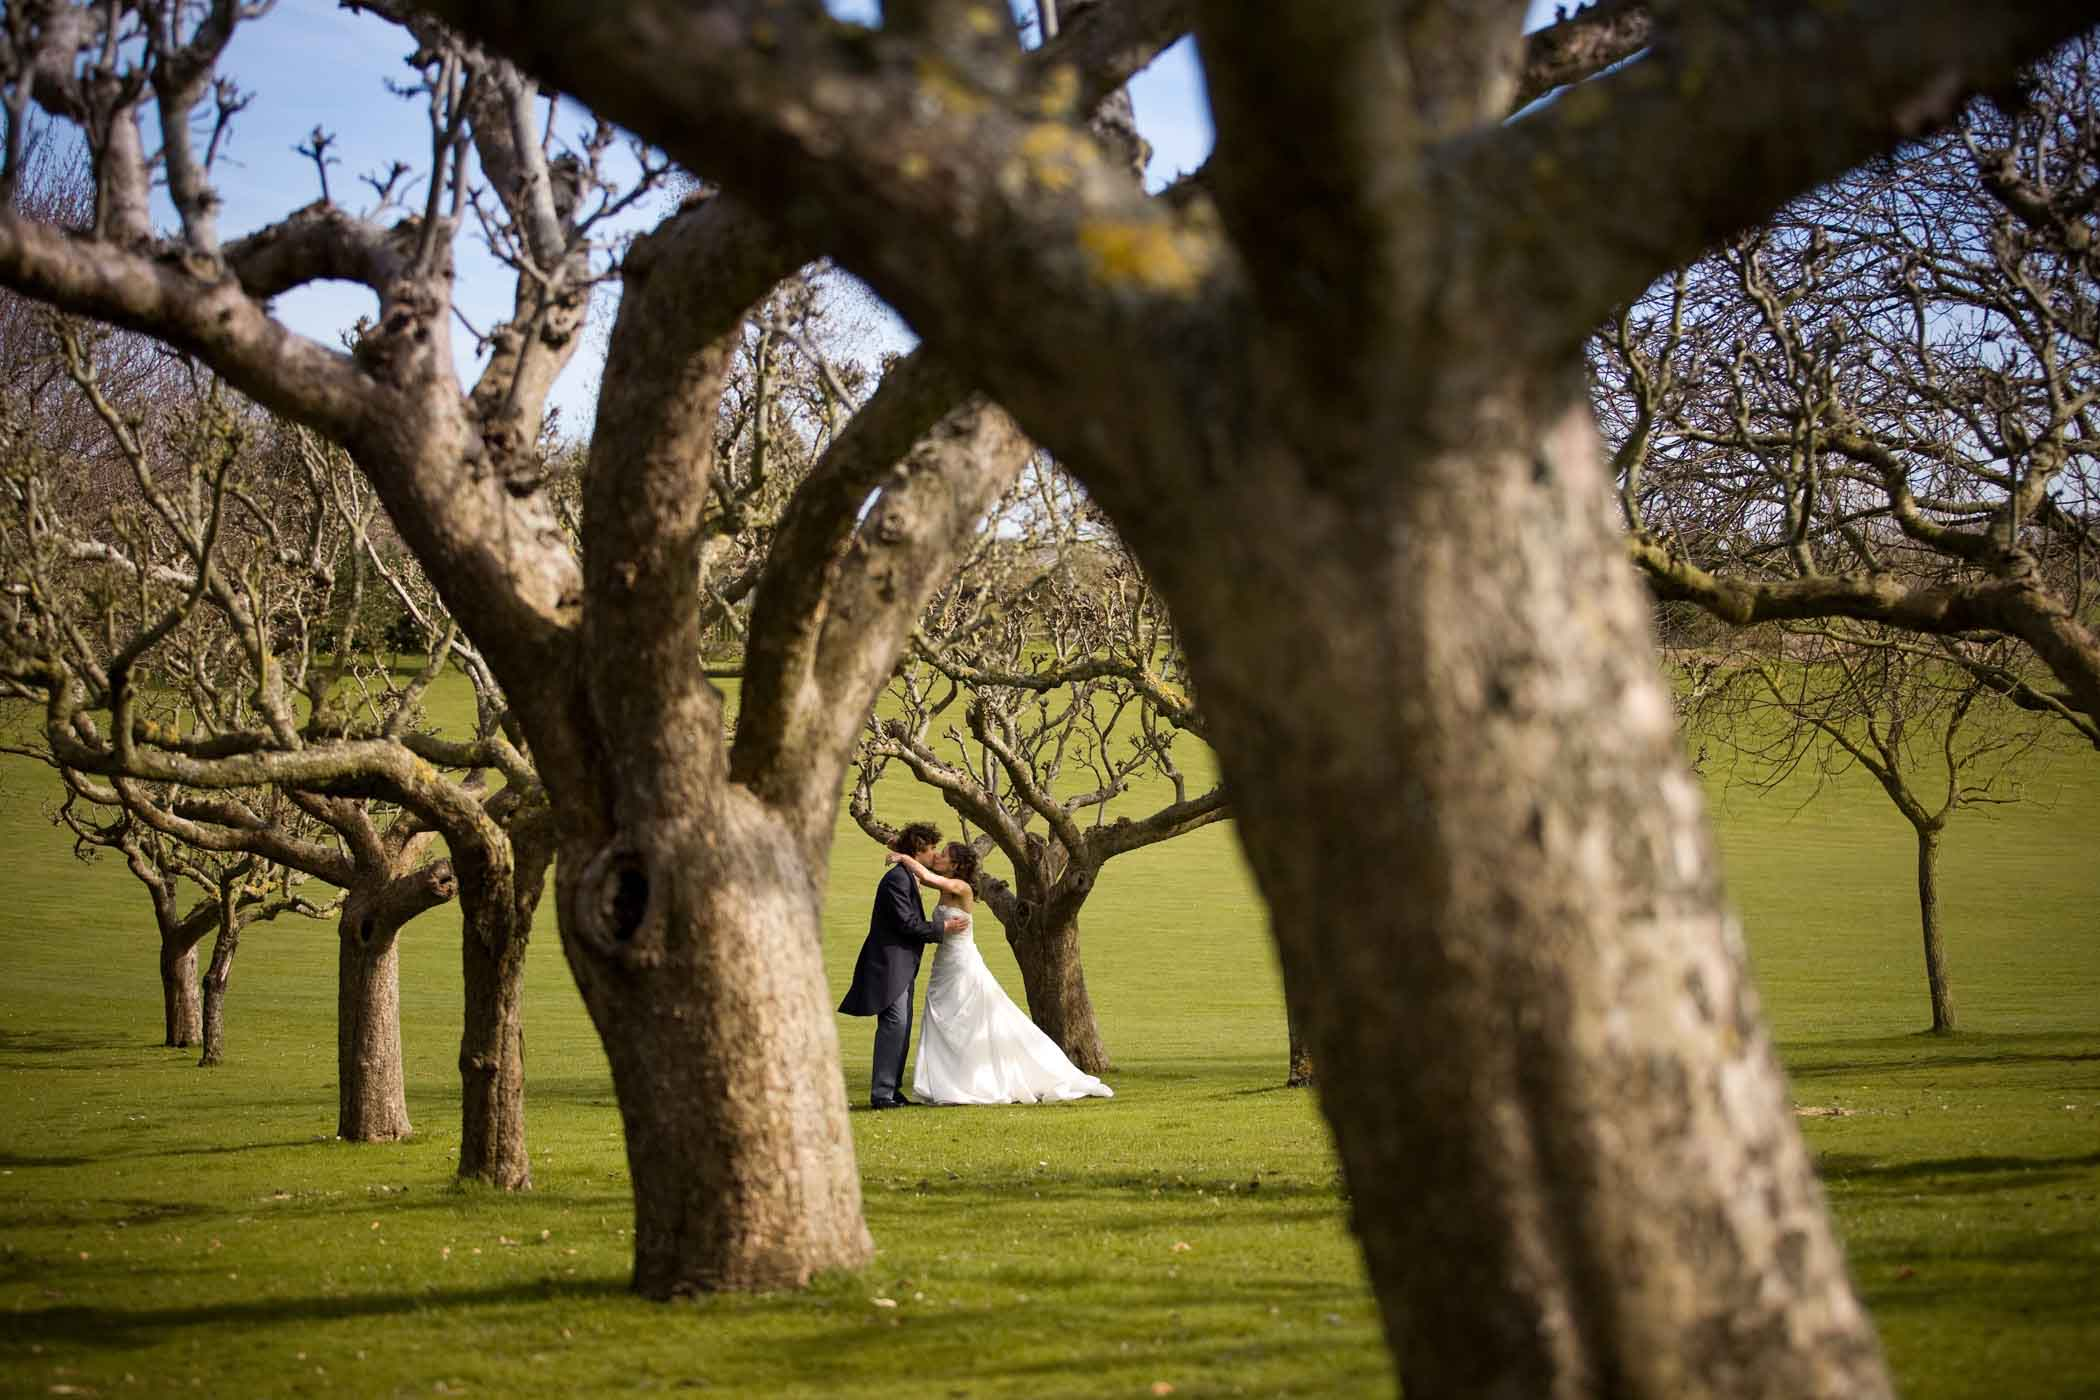 dan_burman_wedding_photography (30).jpg